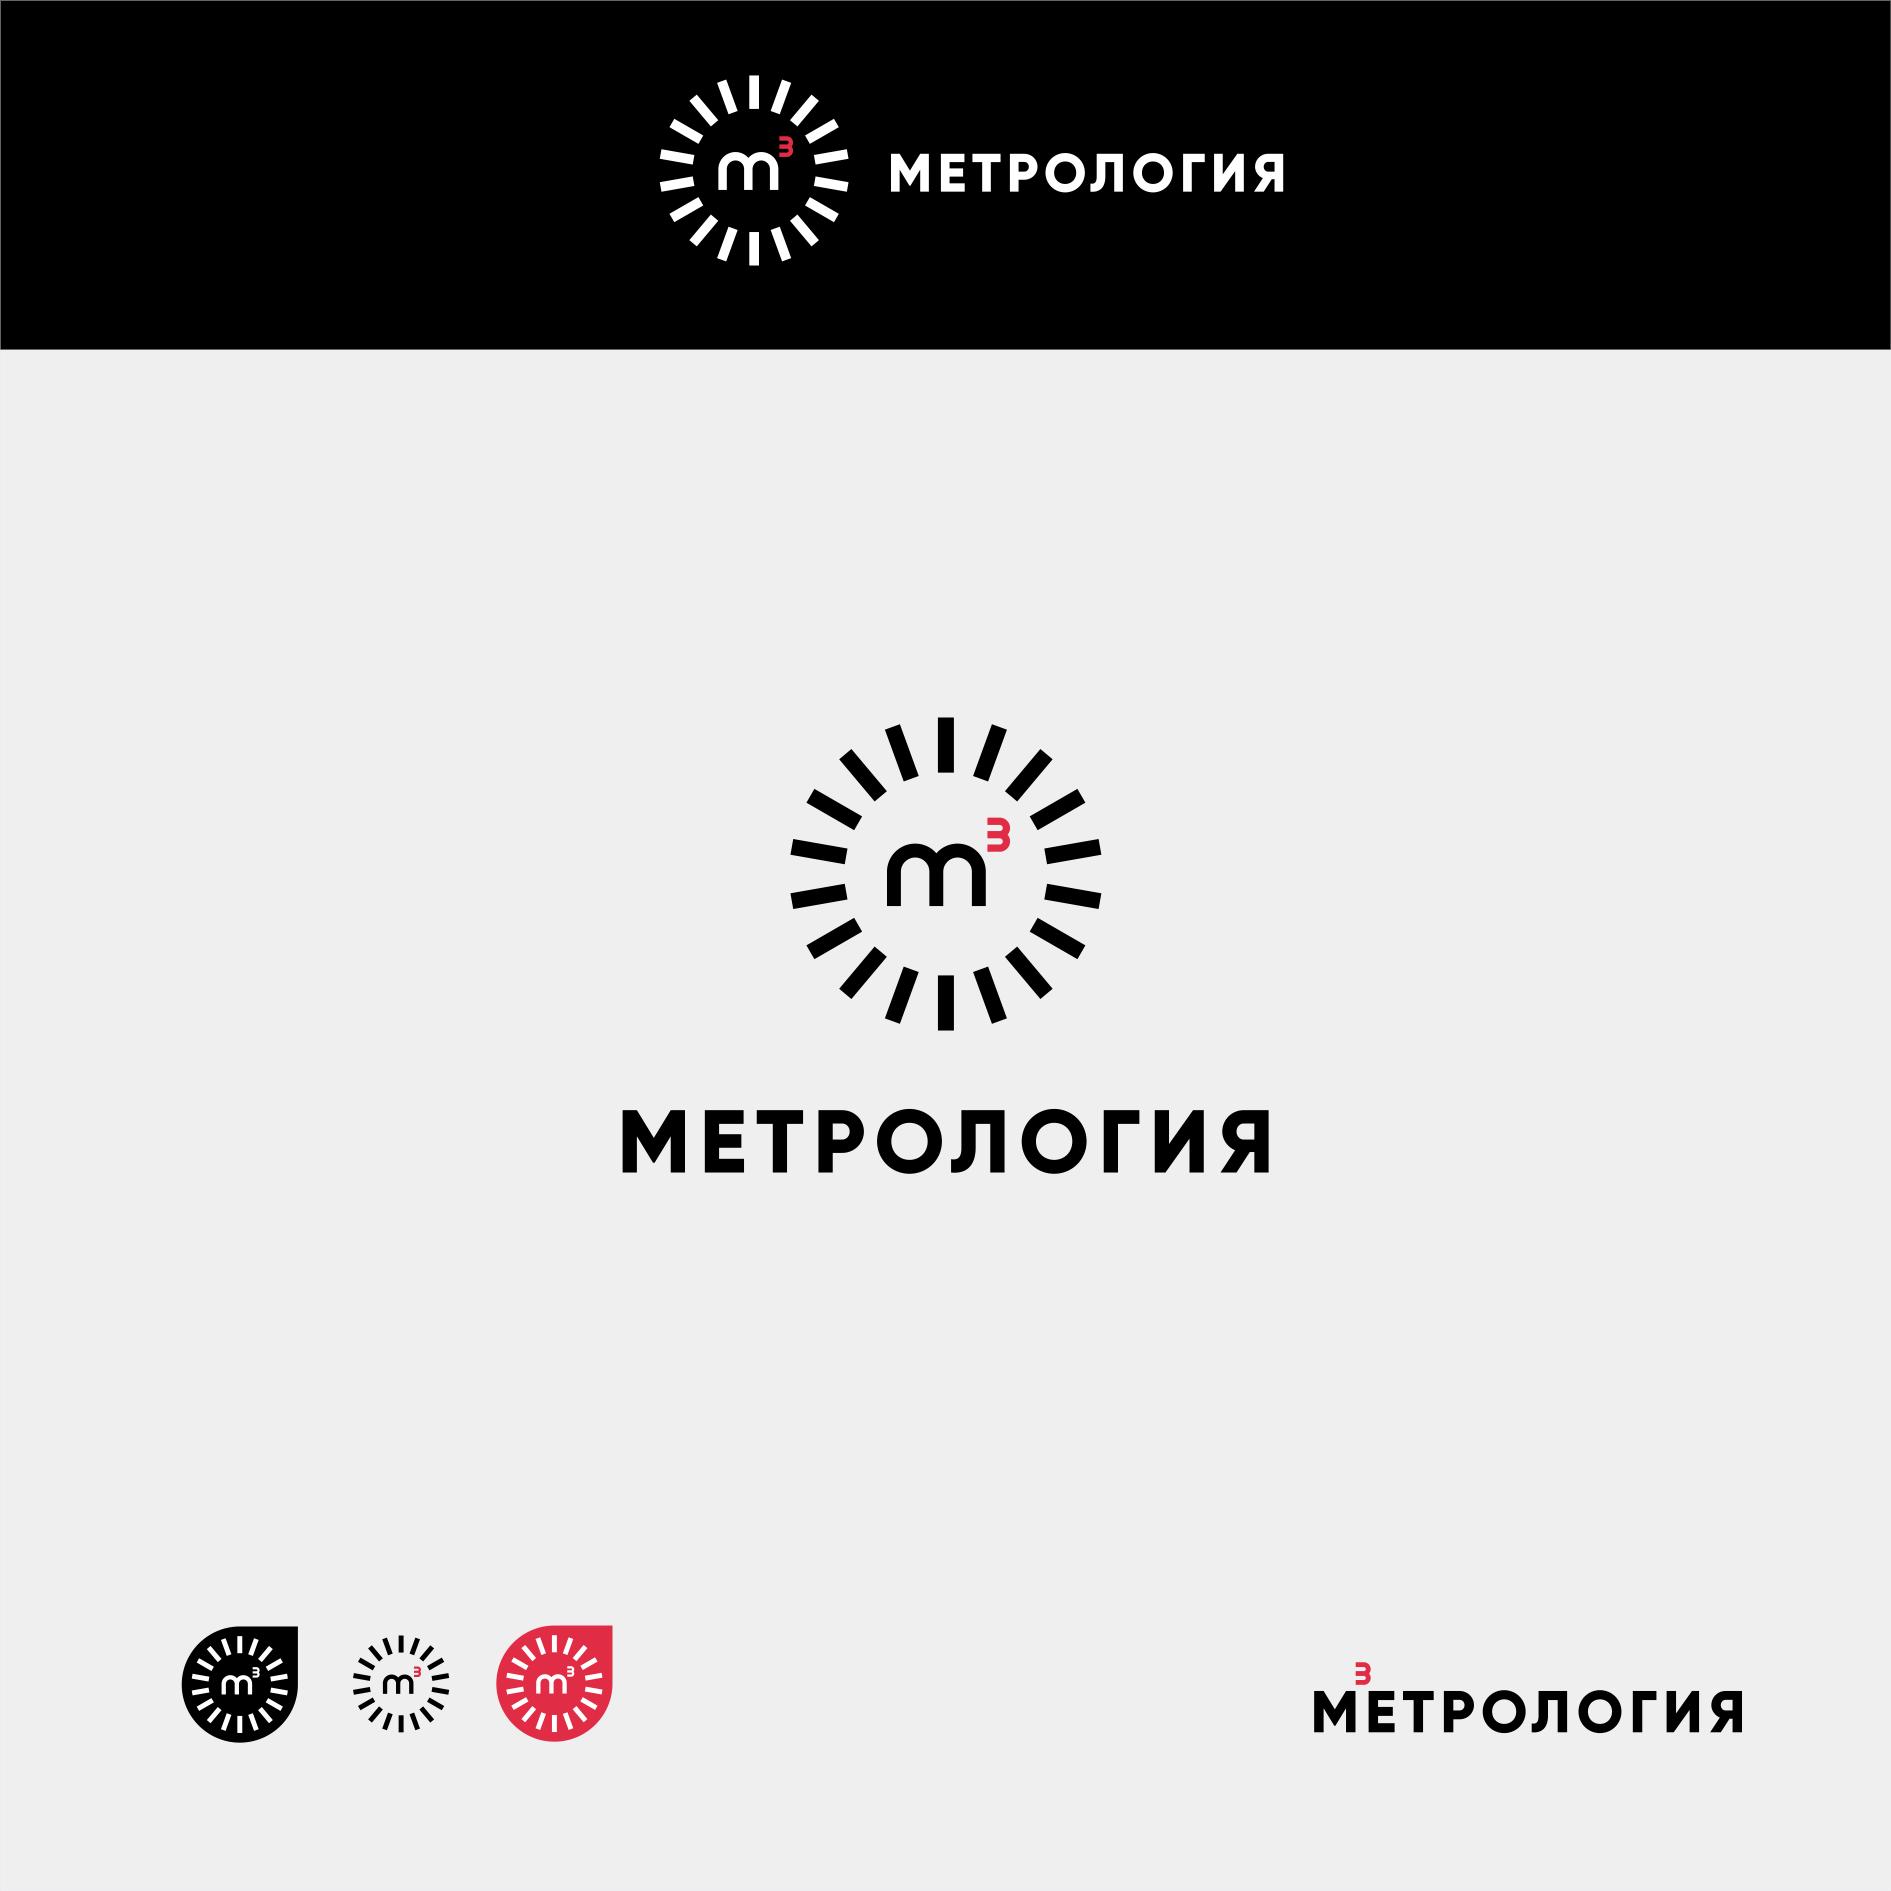 Разработать логотип, визитку, фирменный бланк. фото f_02358f7b7d9757b3.png